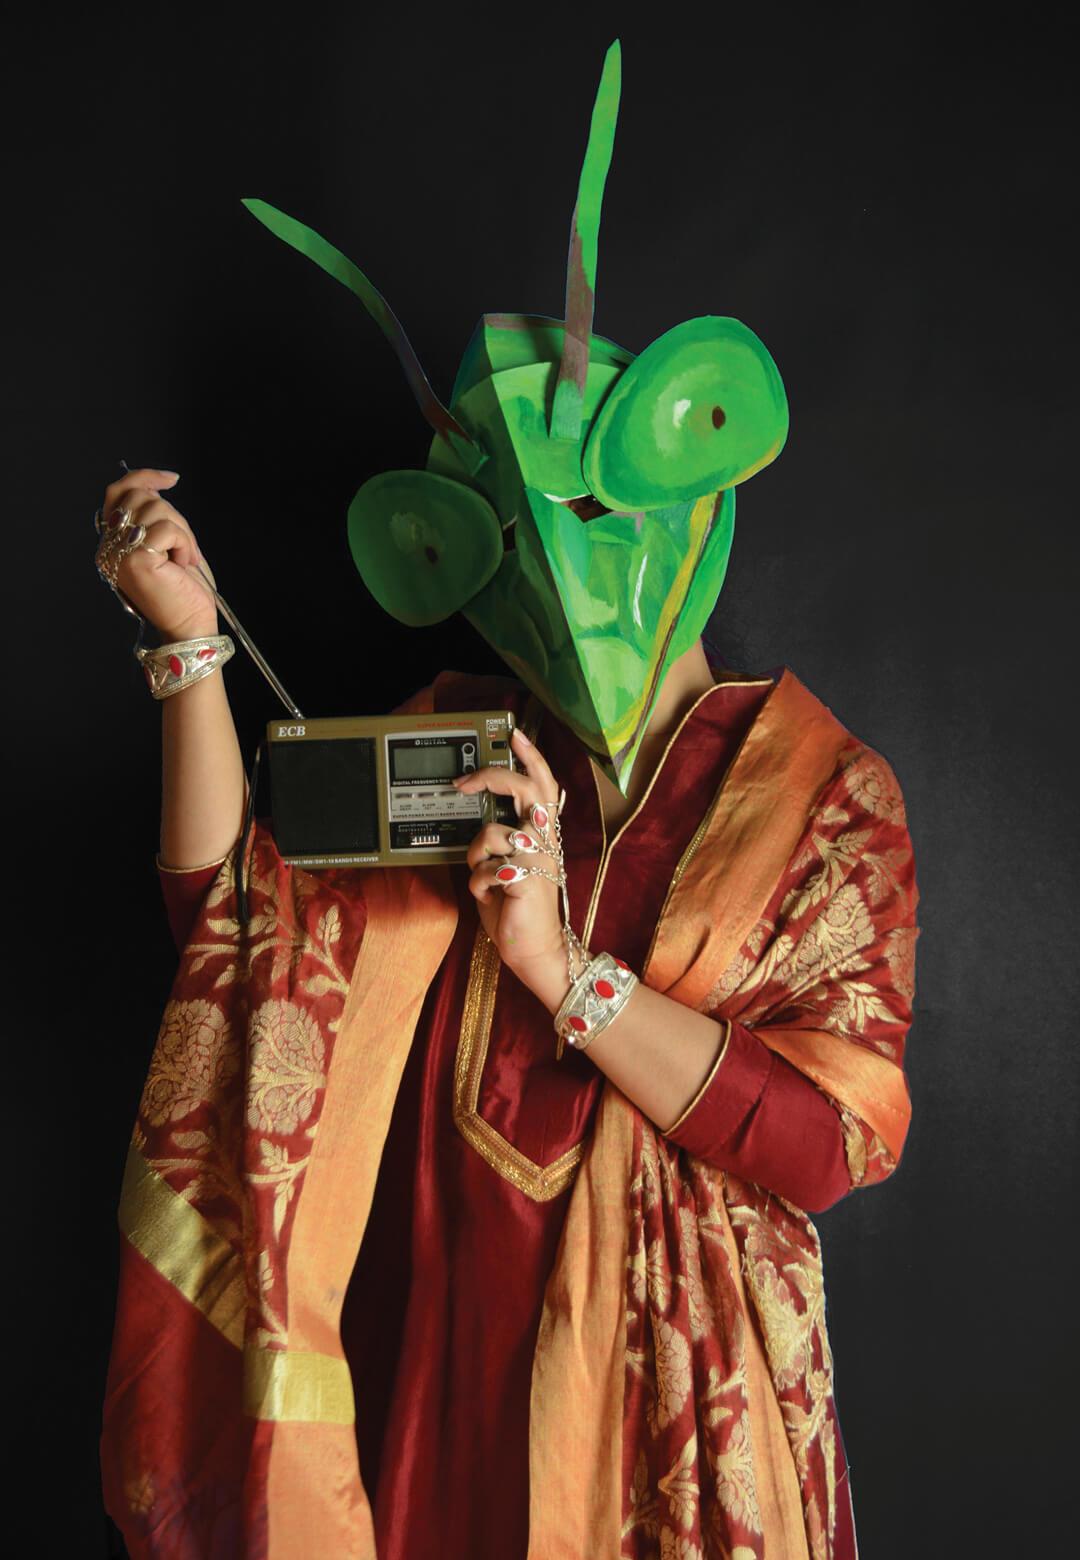 An image from Aamina Hammad's portrait series | Beautiful Heads by Aamina Hammad | STIRworld